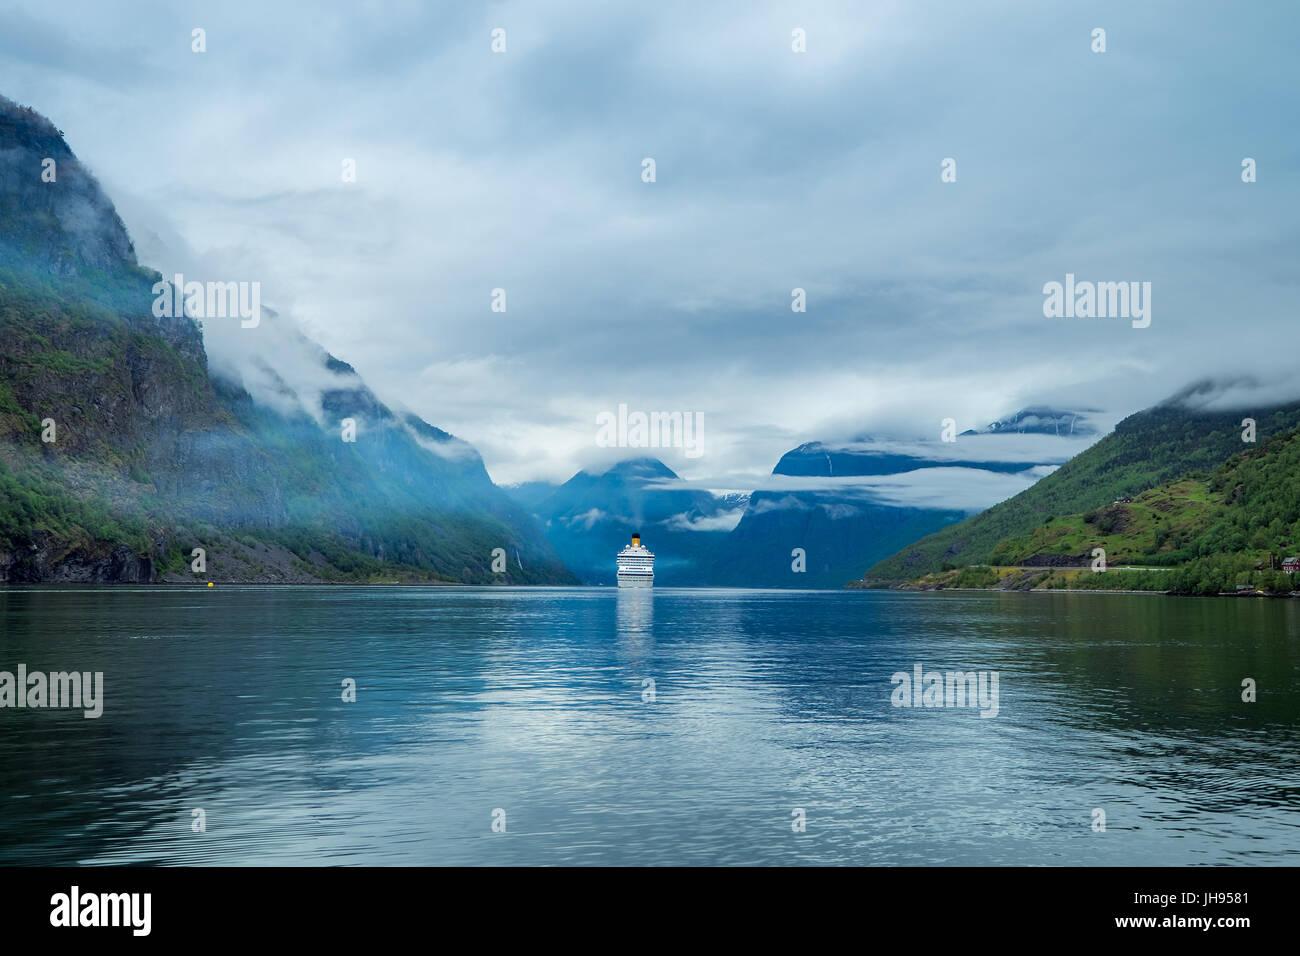 Cruise Ship, Cruise Liners On Hardanger fjorden, Norway - Stock Image